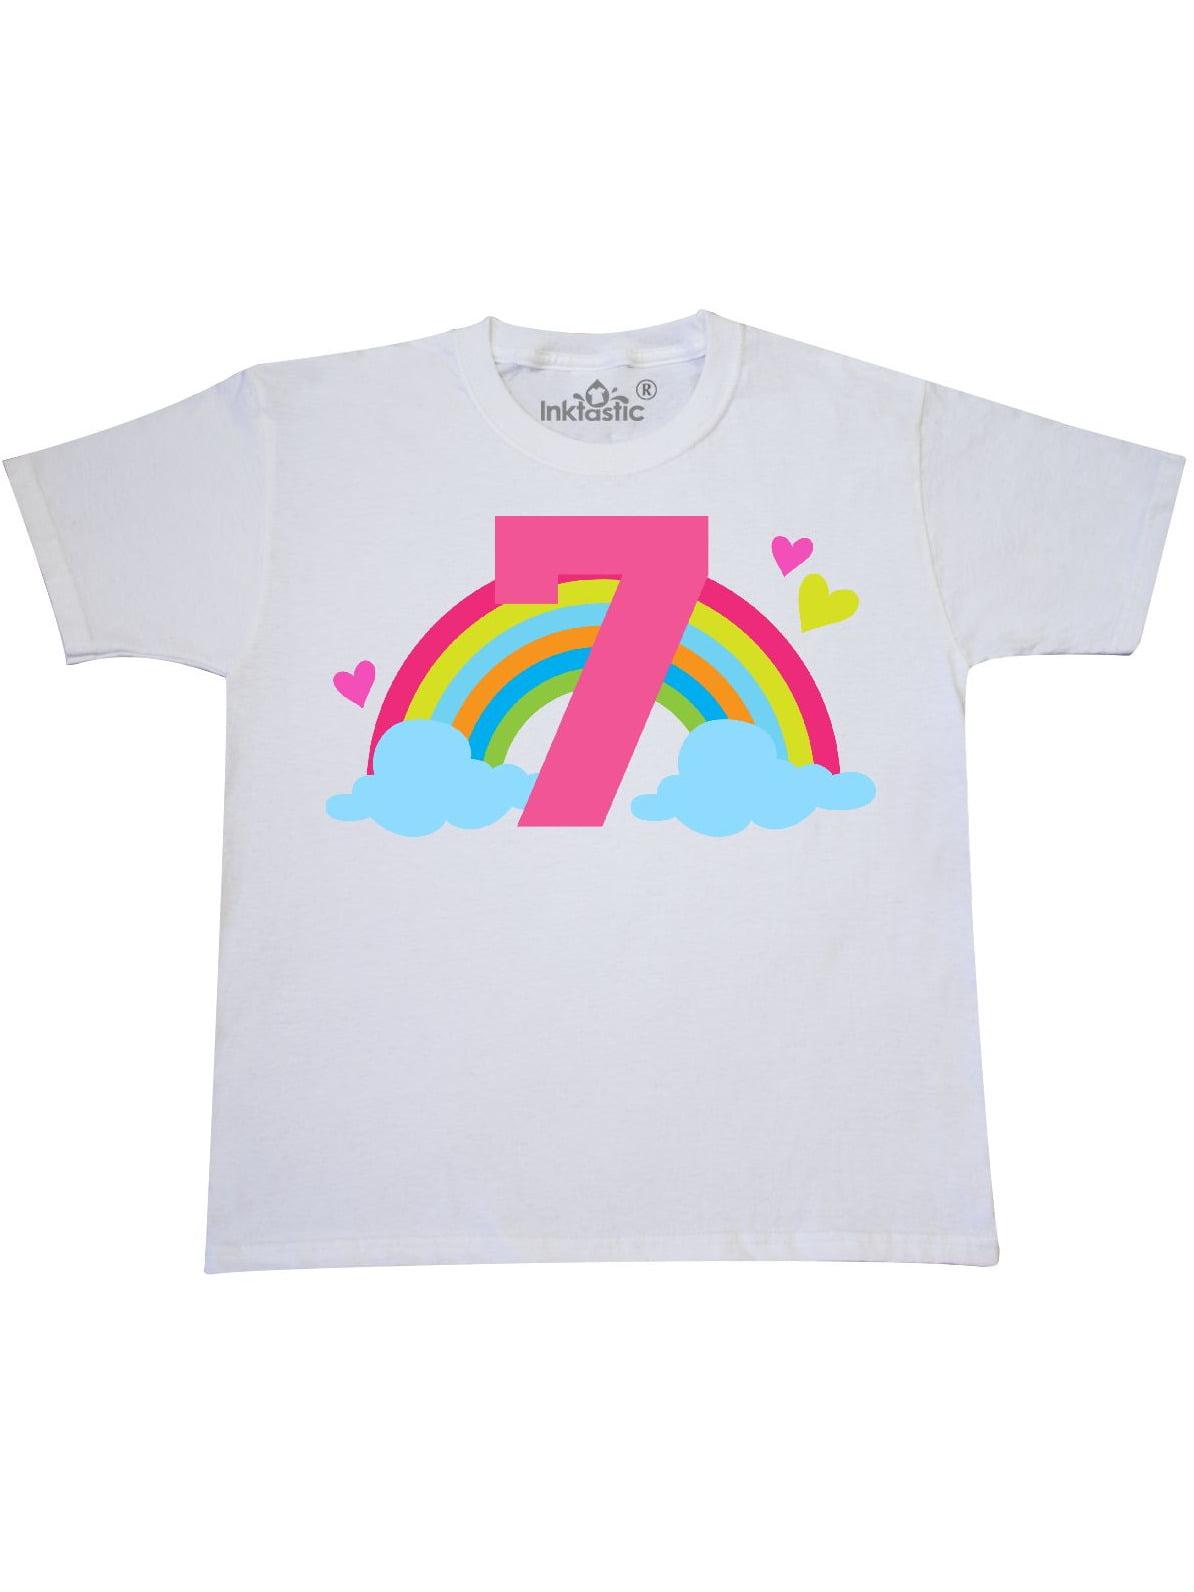 7th Birthday Rainbow Youth T-Shirt